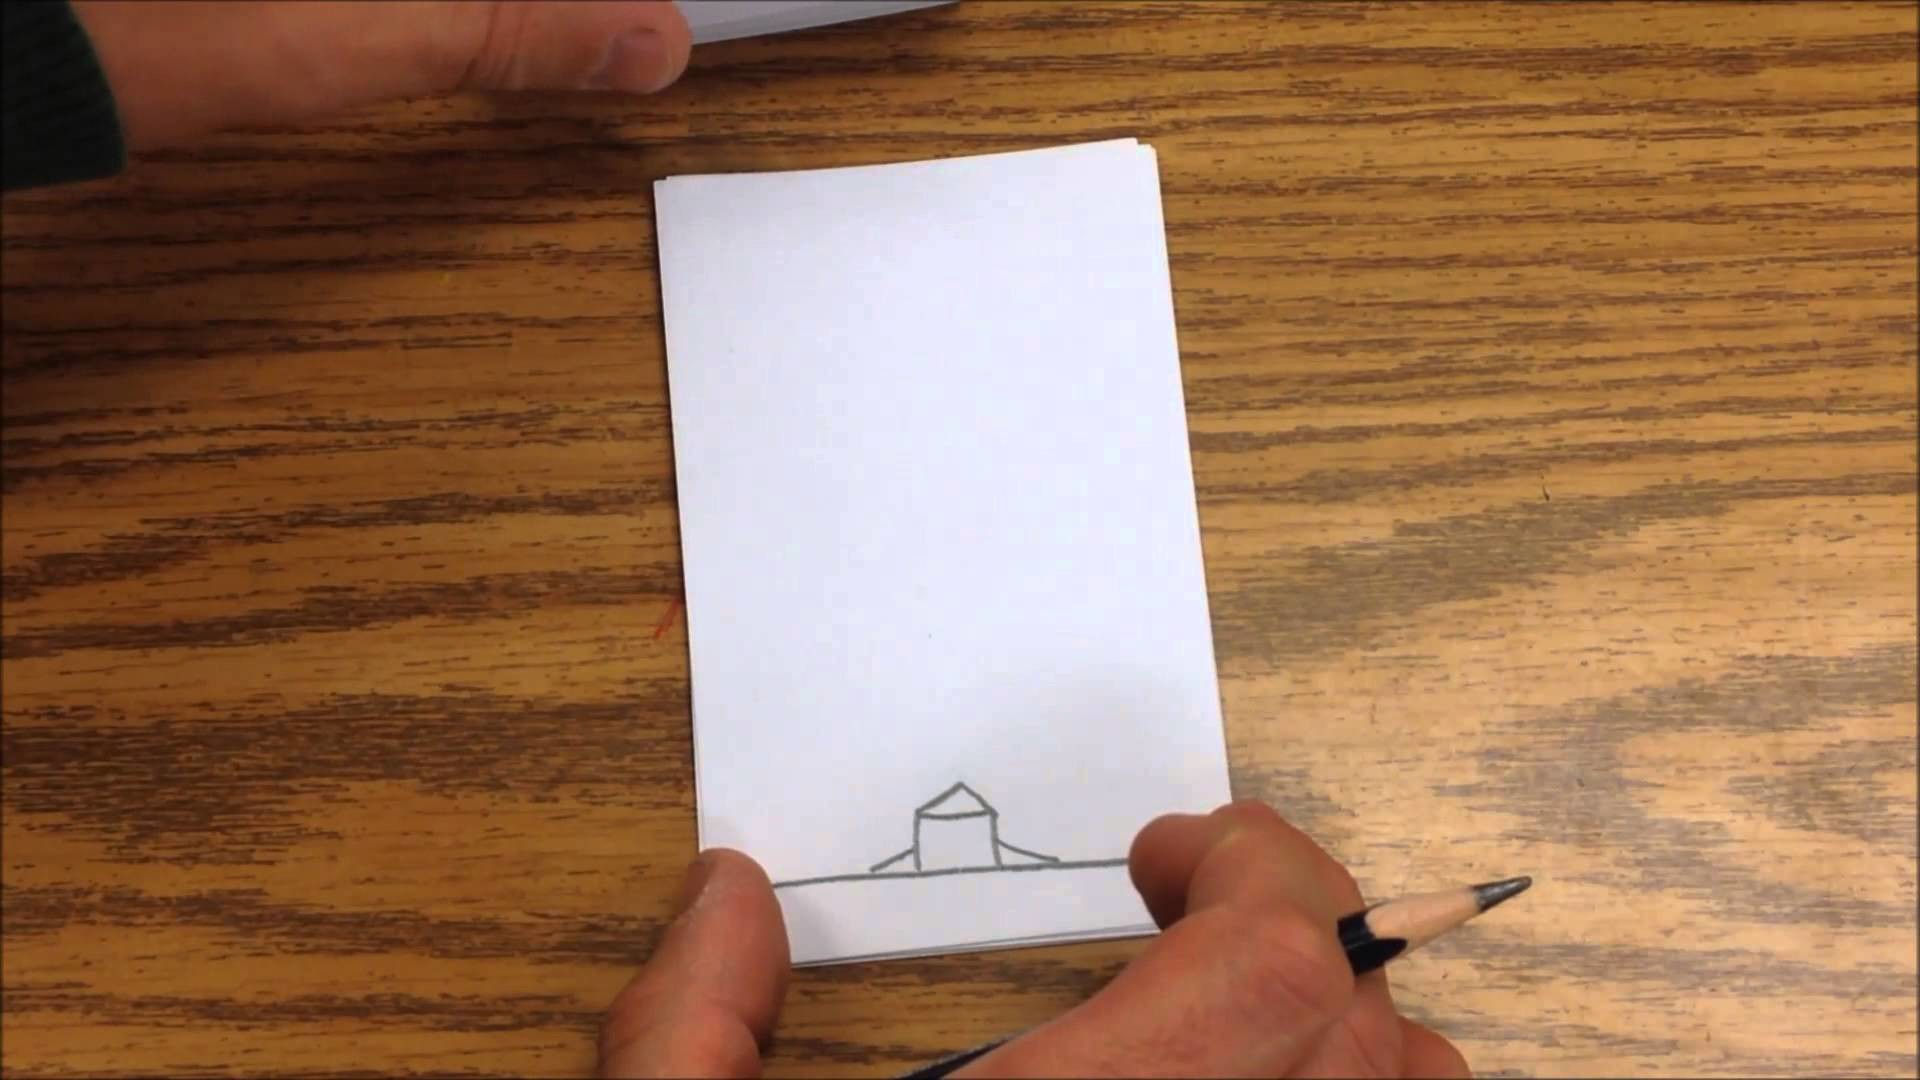 How to make a flipbook